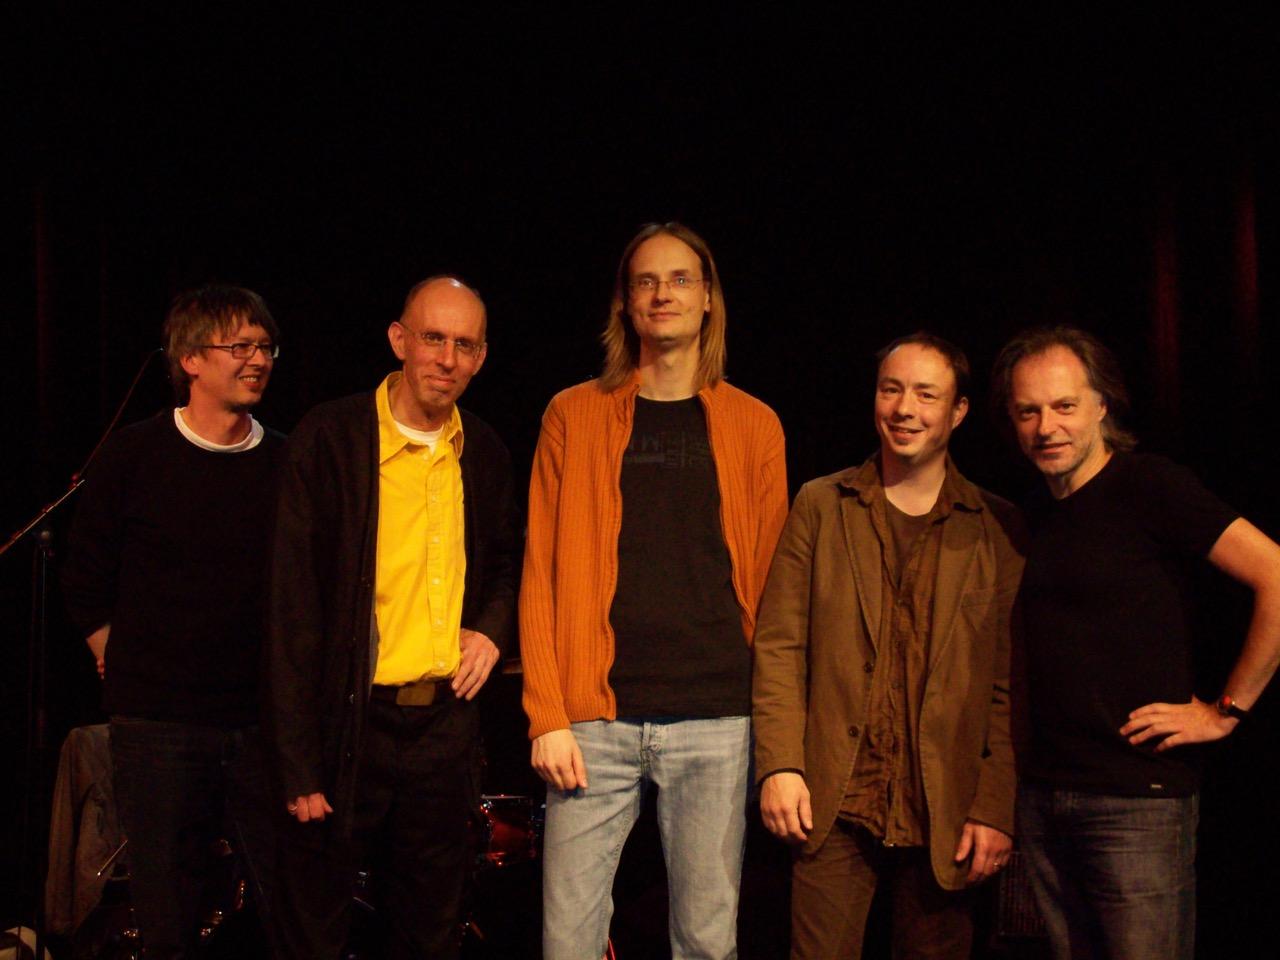 Gospel & Soul Jazz Open Air - Doppelkonzert Kultursommer Summarum